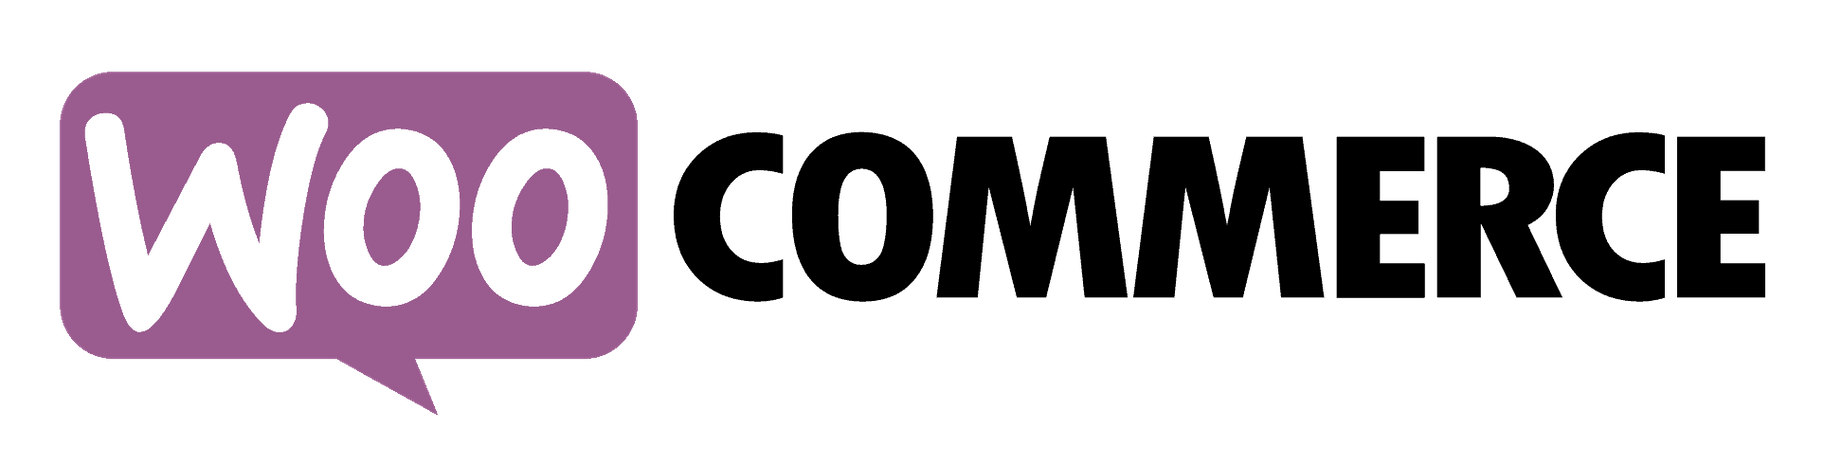 Open-Source Ecommerce Platform: WooCommerce